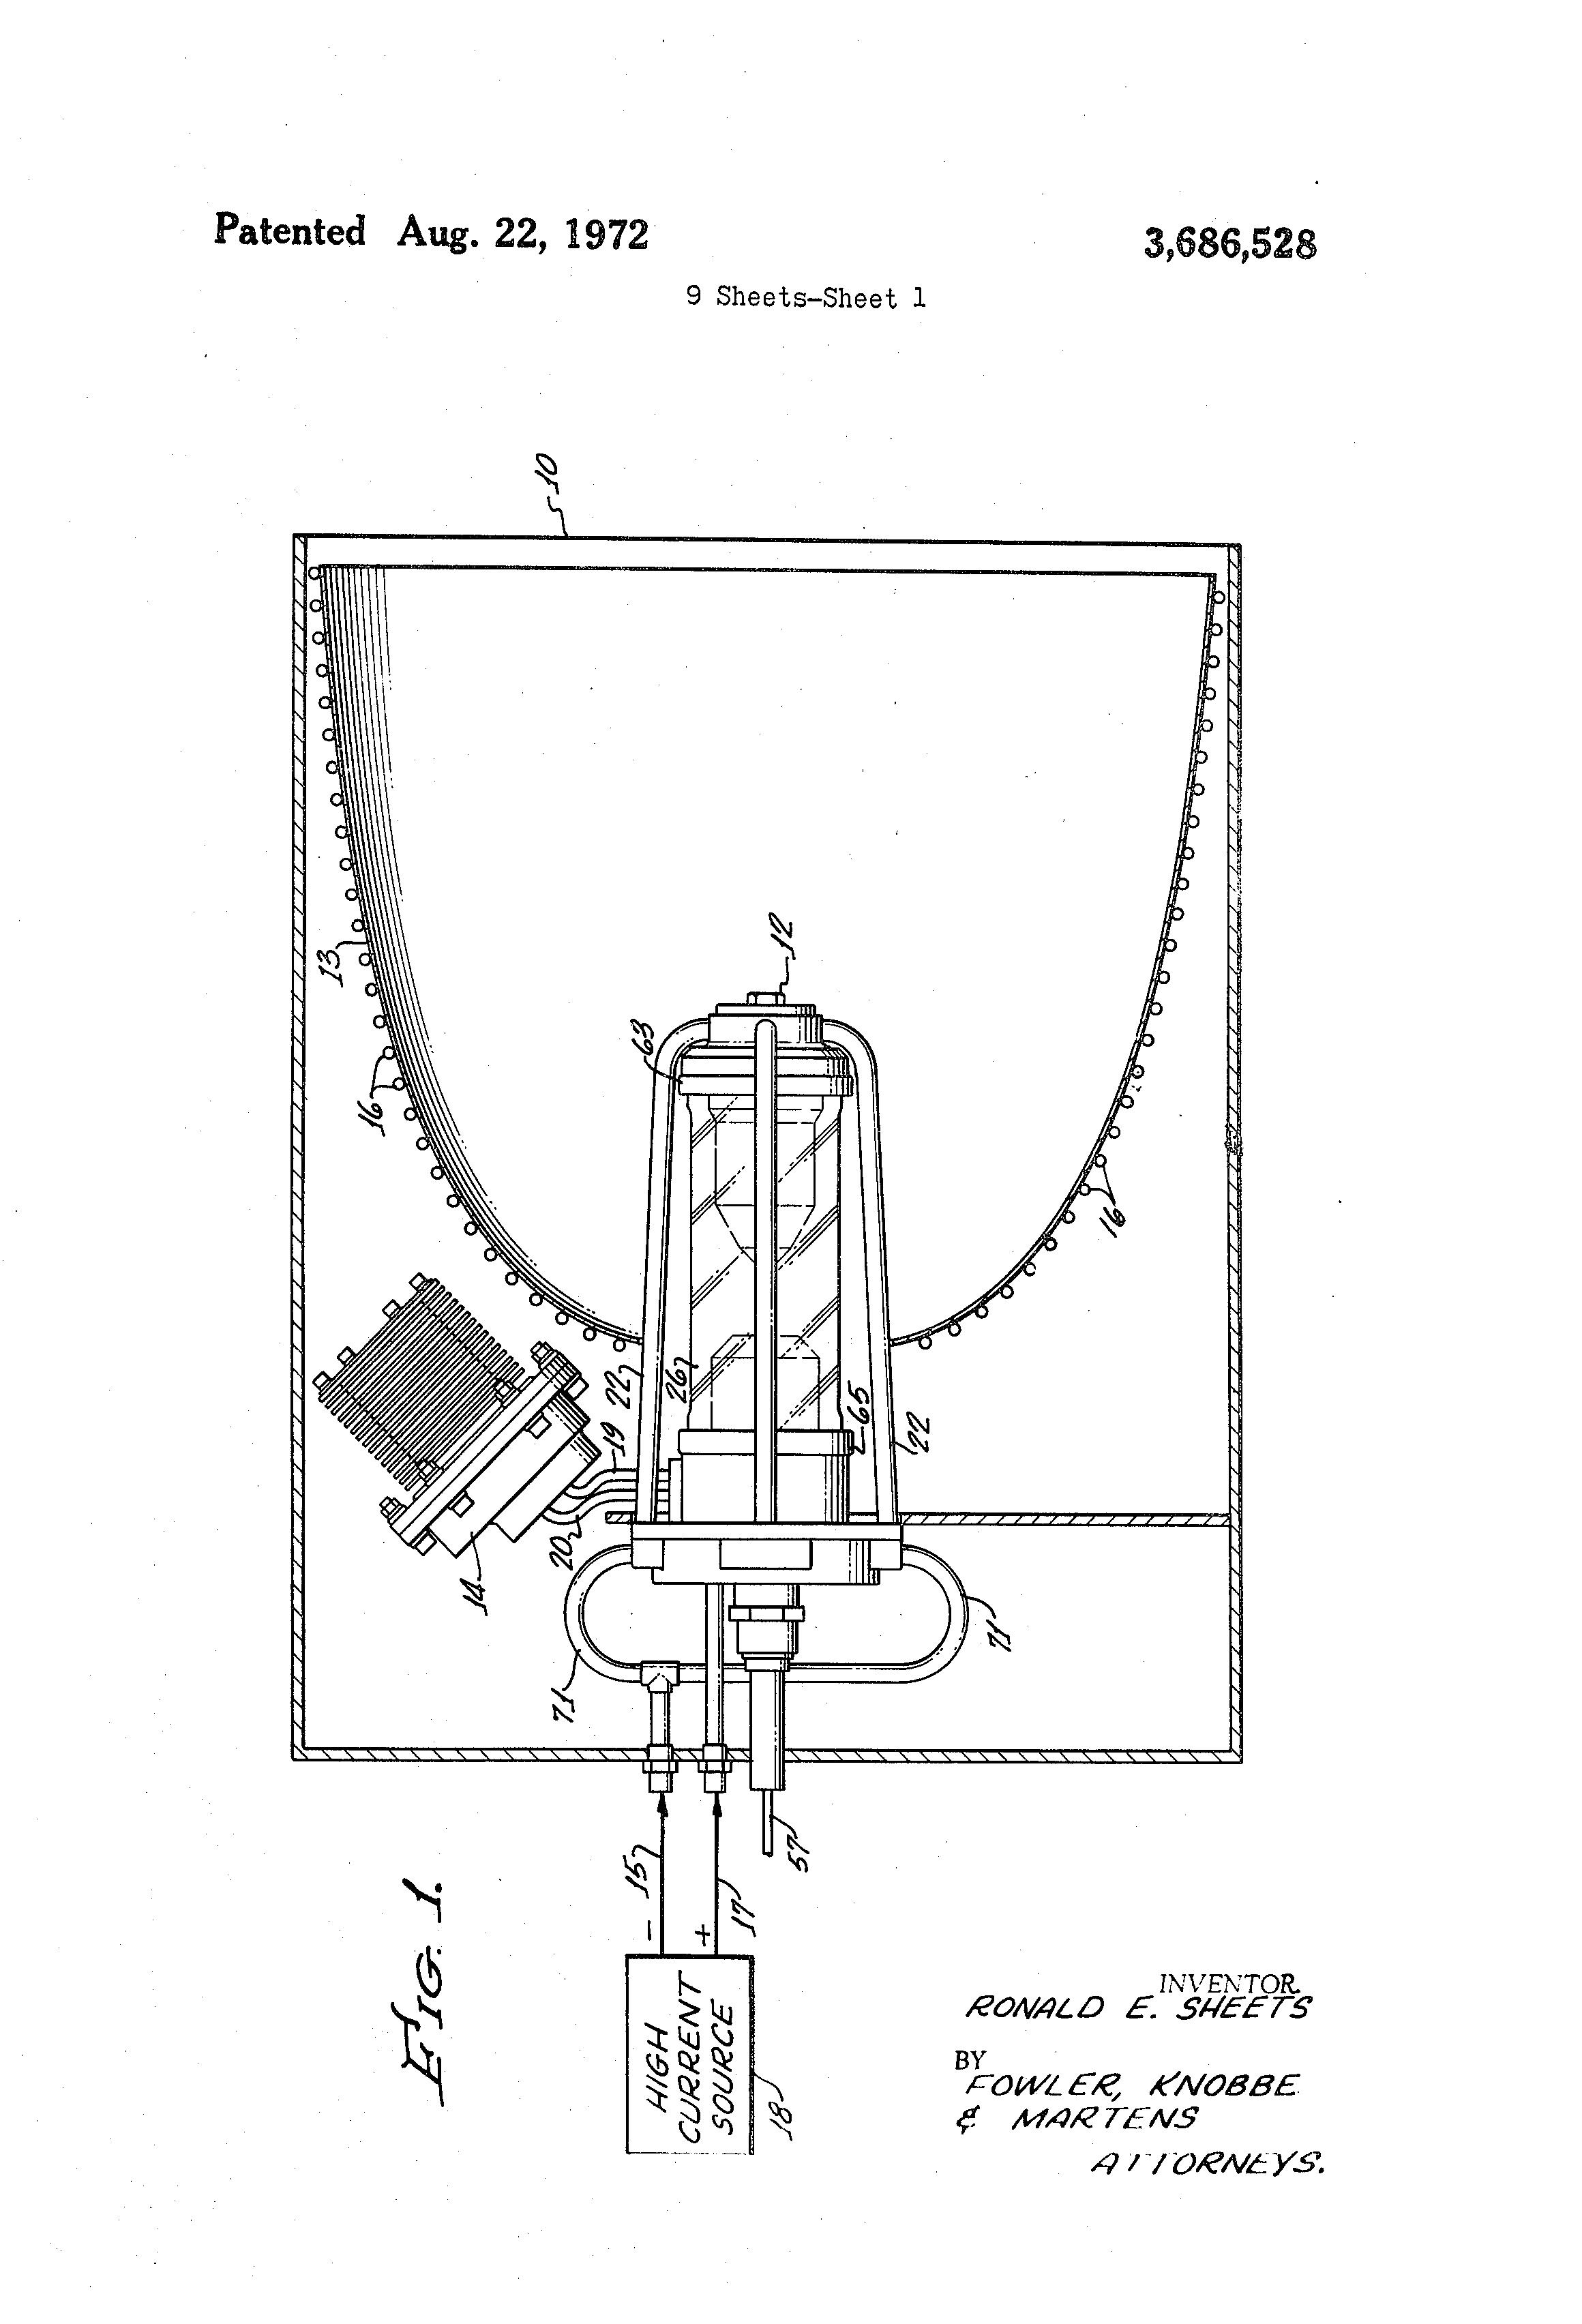 [TBQL_4184]  Arco Wiring Diagram 1997 Geo Prizm Fuse Panel Diagram -  end.the-damboel-12.florimunt.fr   Arco Wiring Diagram      end.the-damboel-12.florimunt.fr